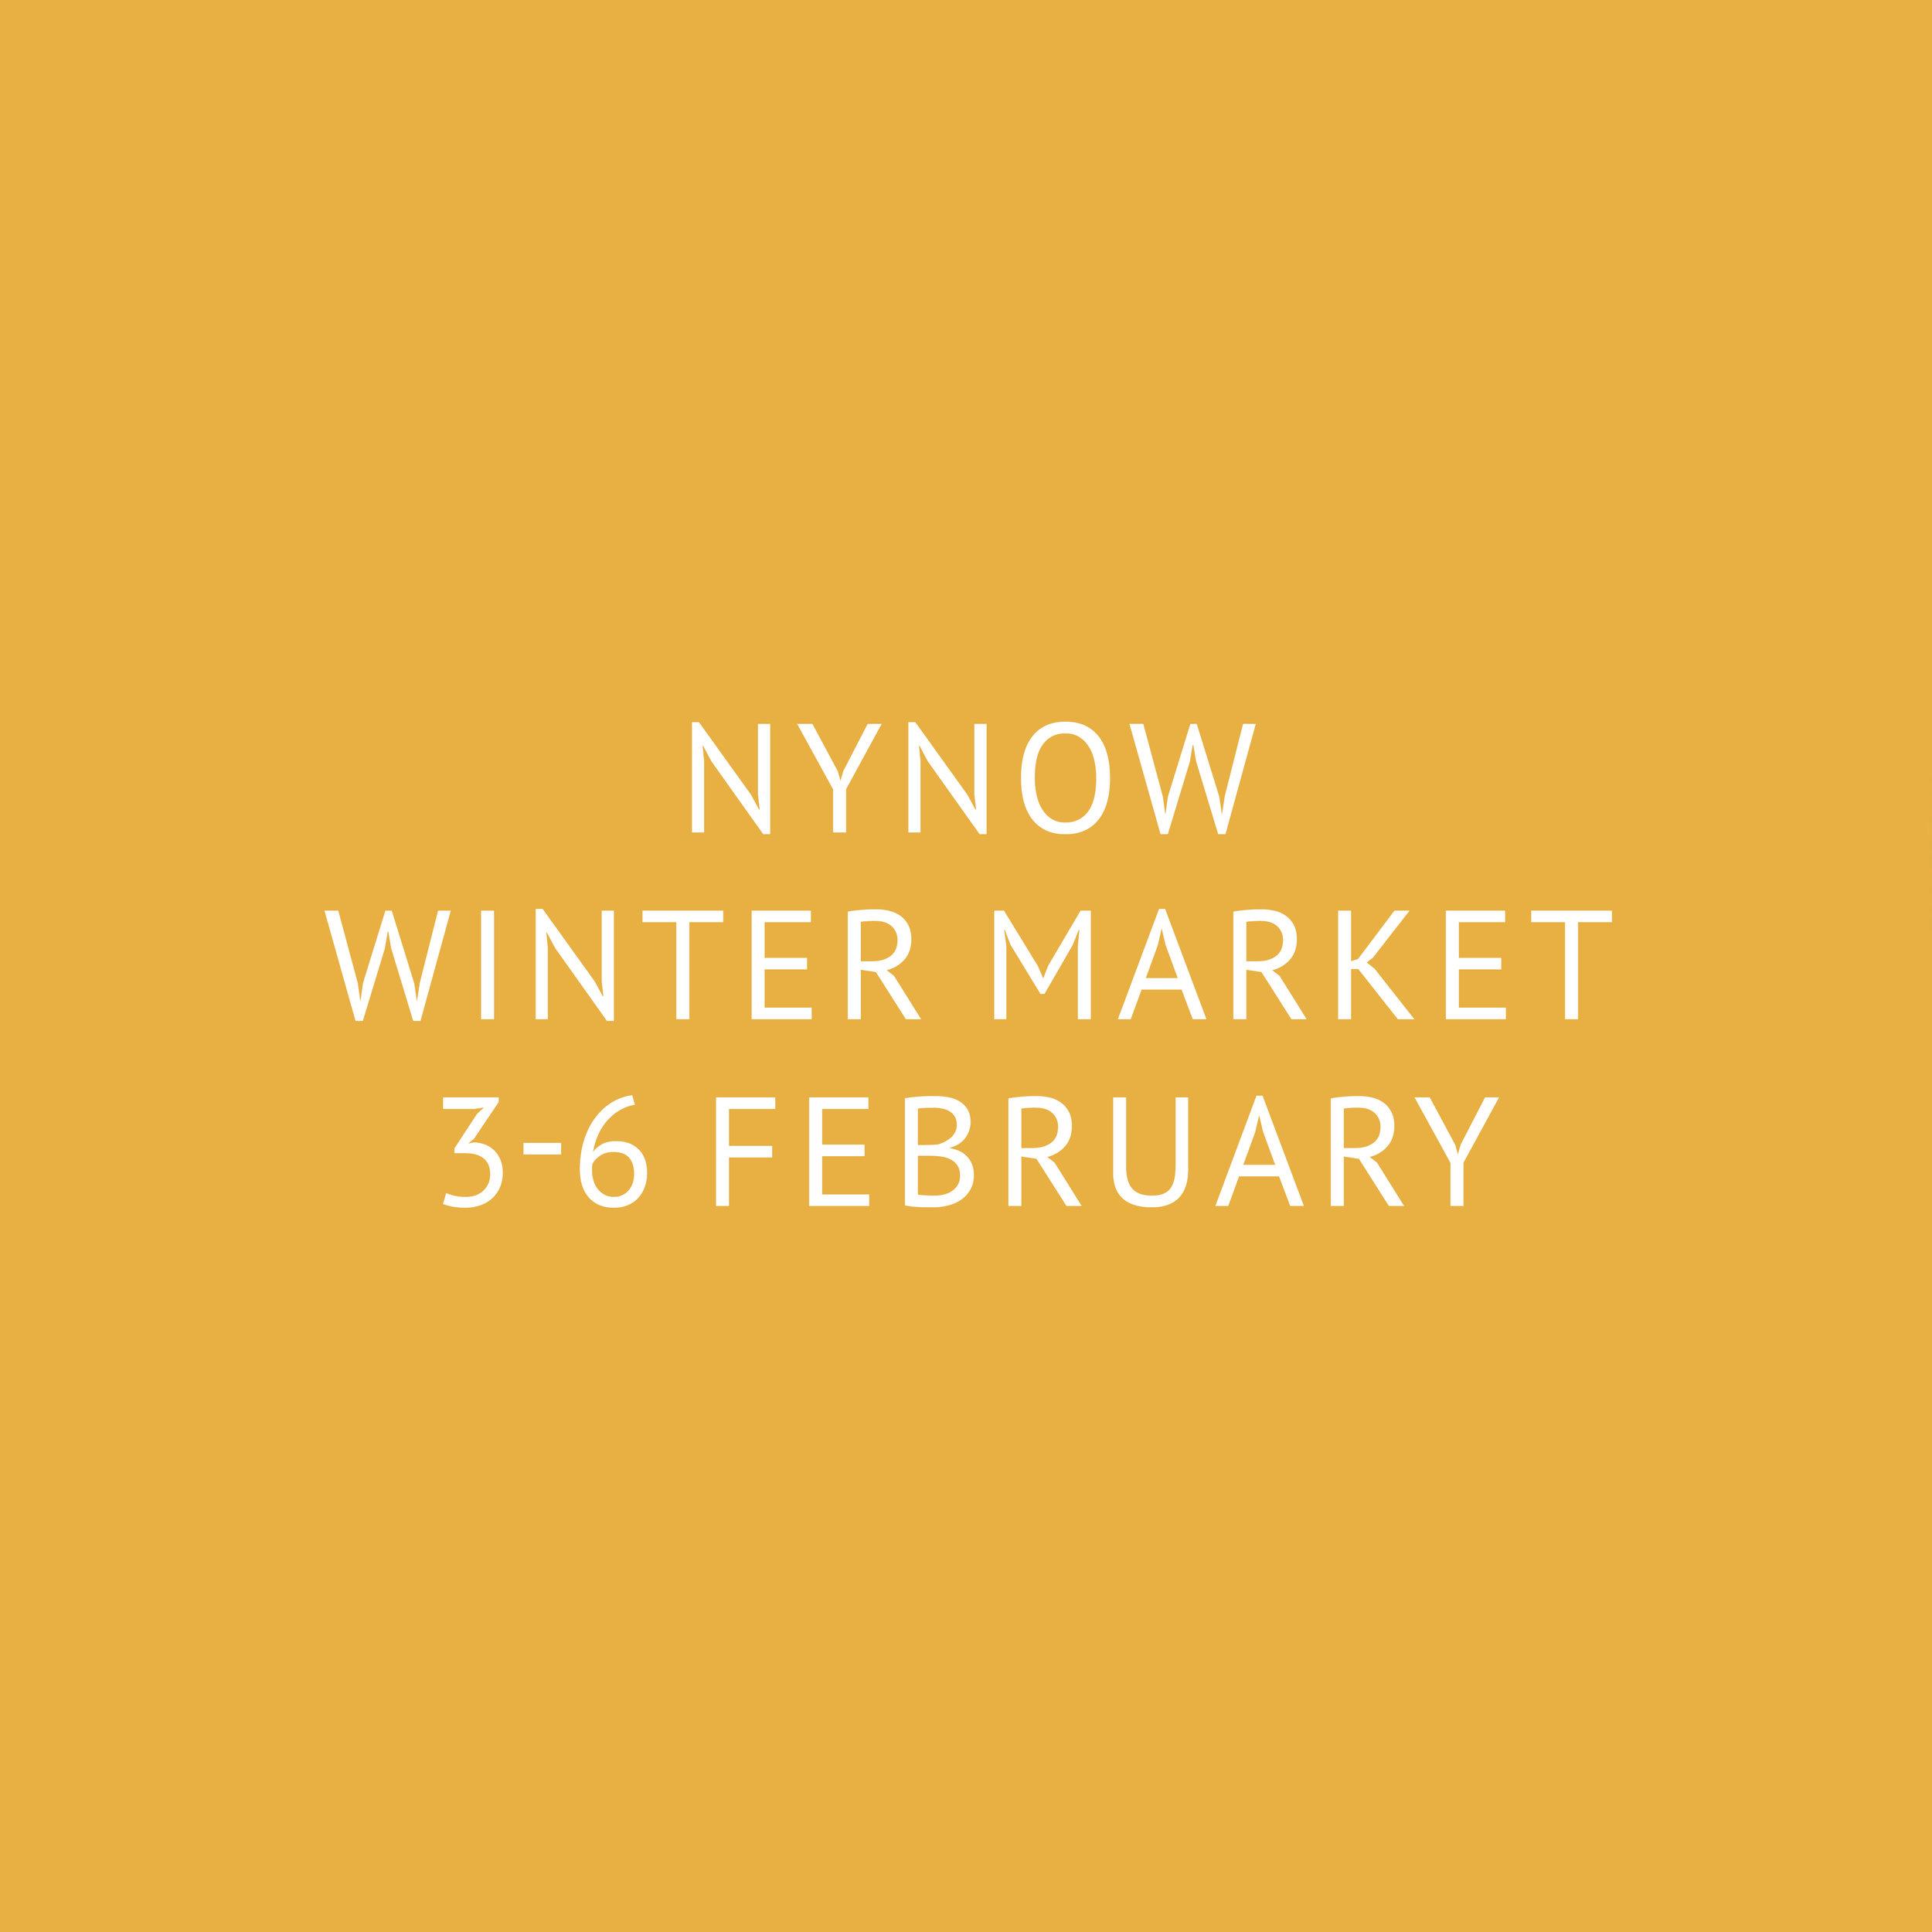 nynow winter market.jpg